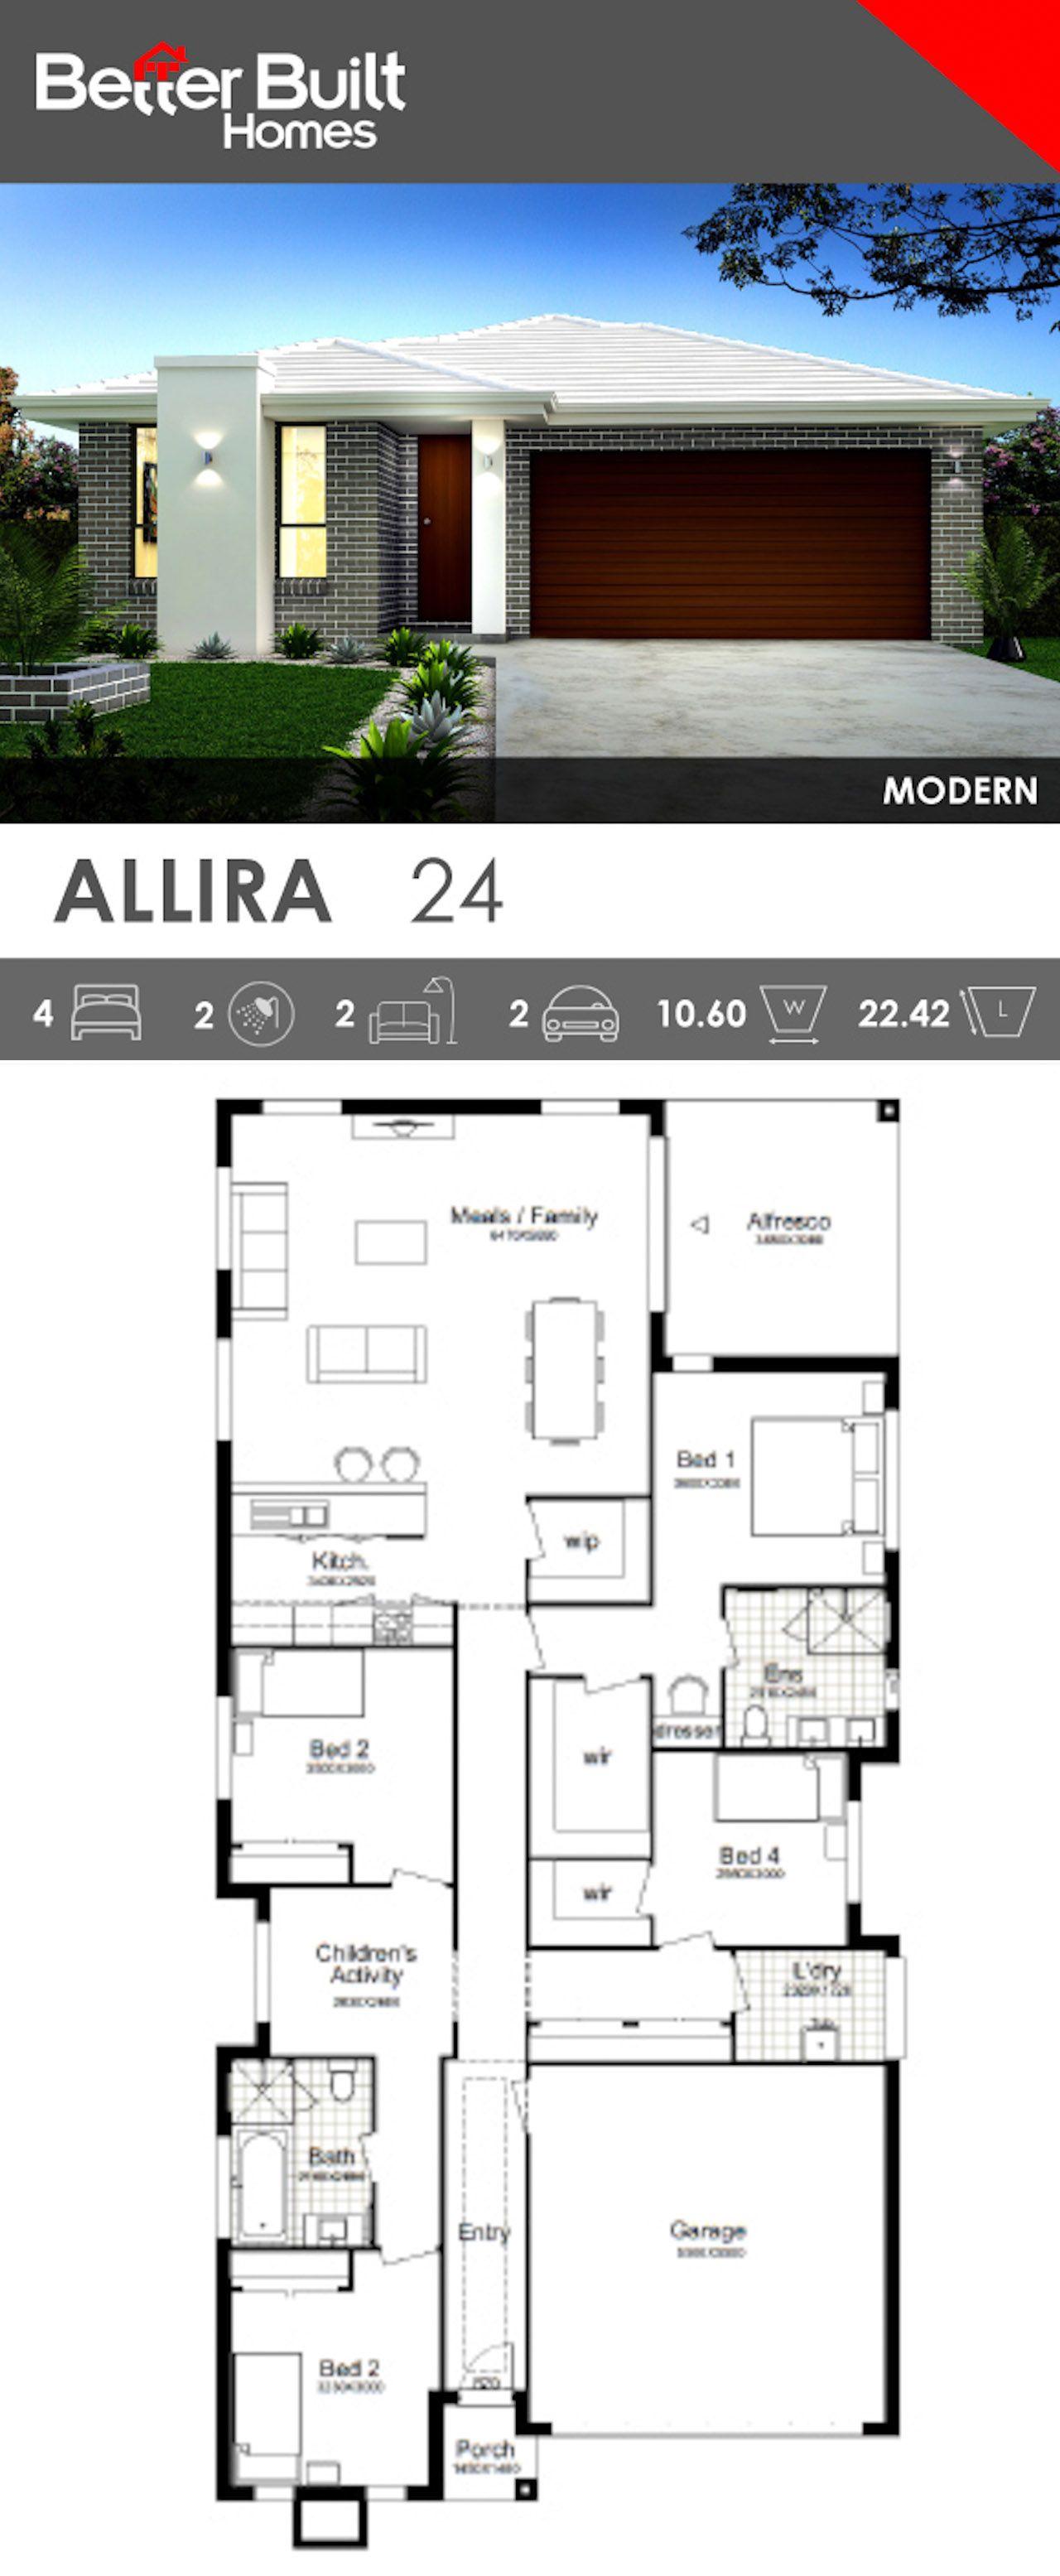 Single Storey House Design - Allira 24. This smart contemporary ...